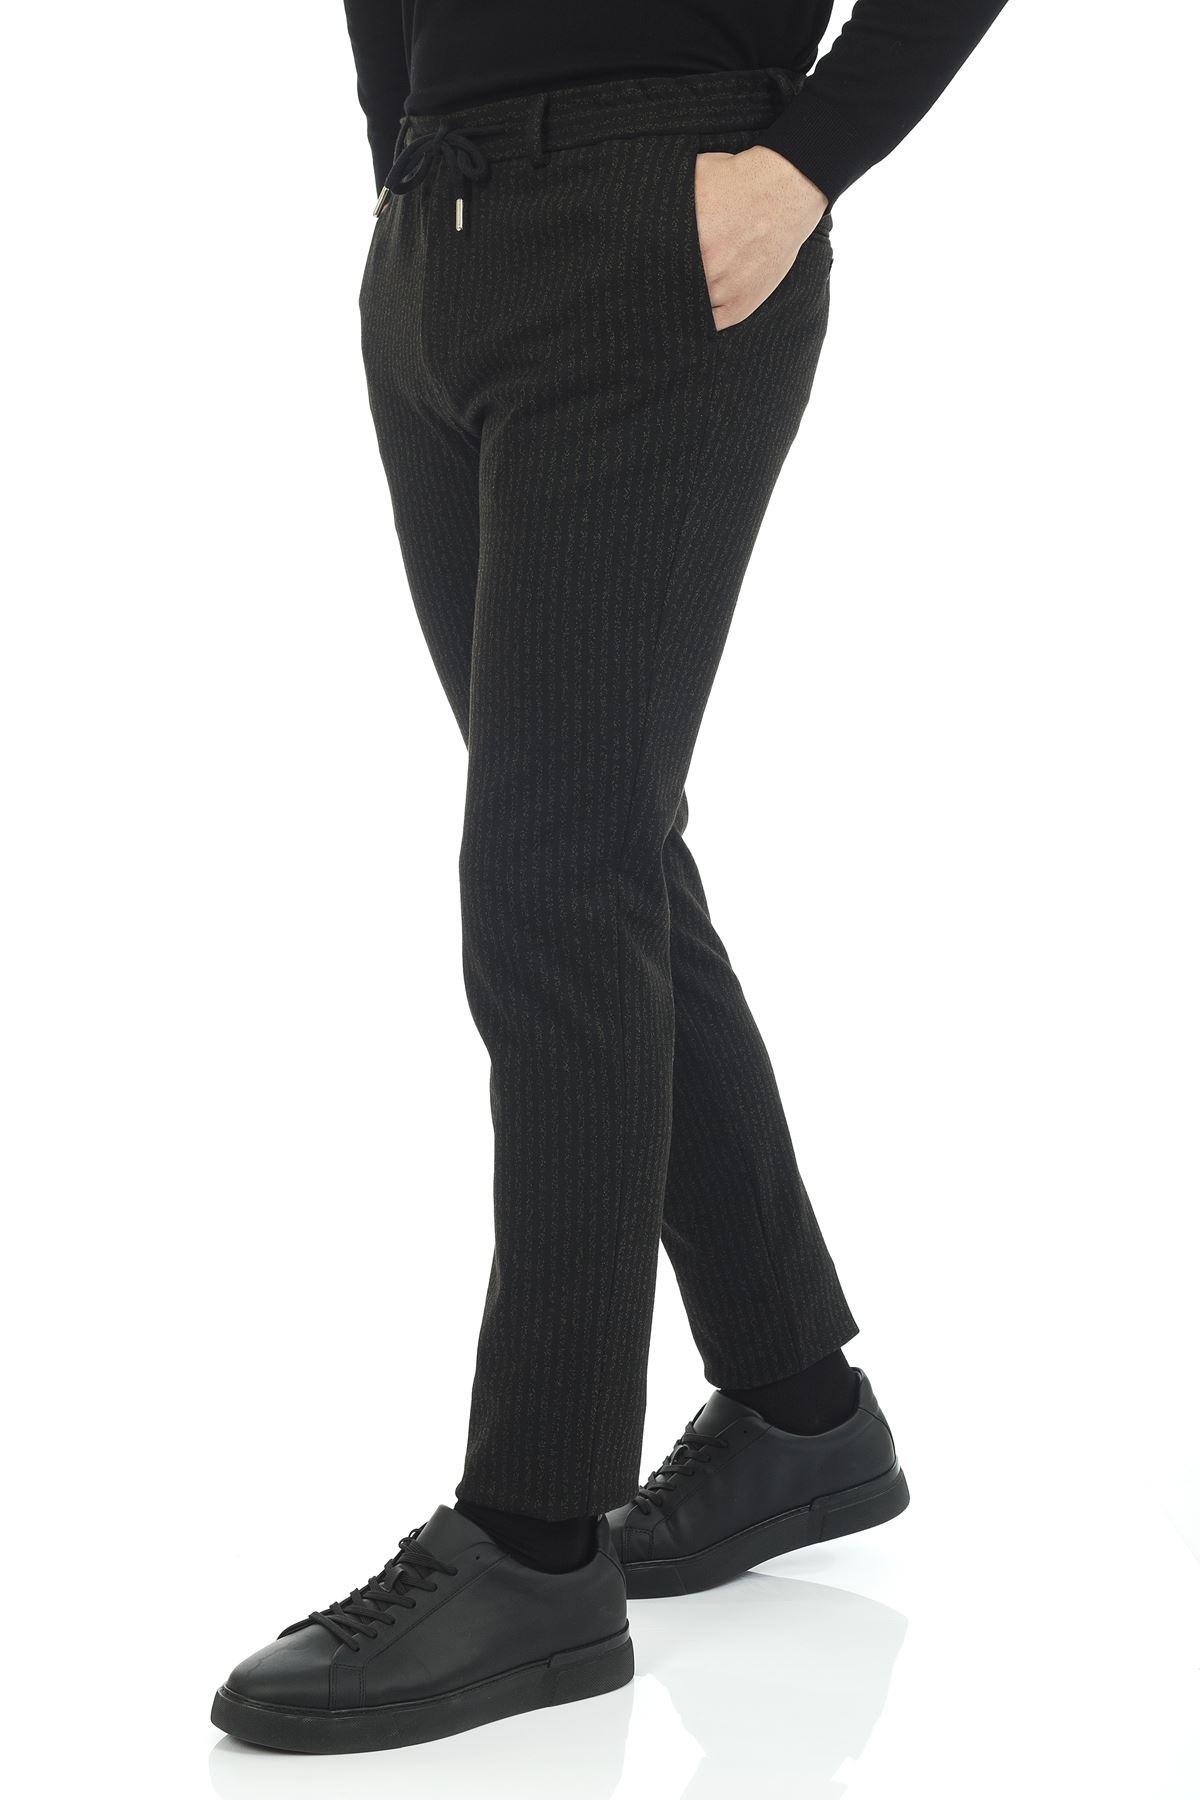 Siyah Yeşil Çizgili Süper Slim Kalıp Jogger Pantolon